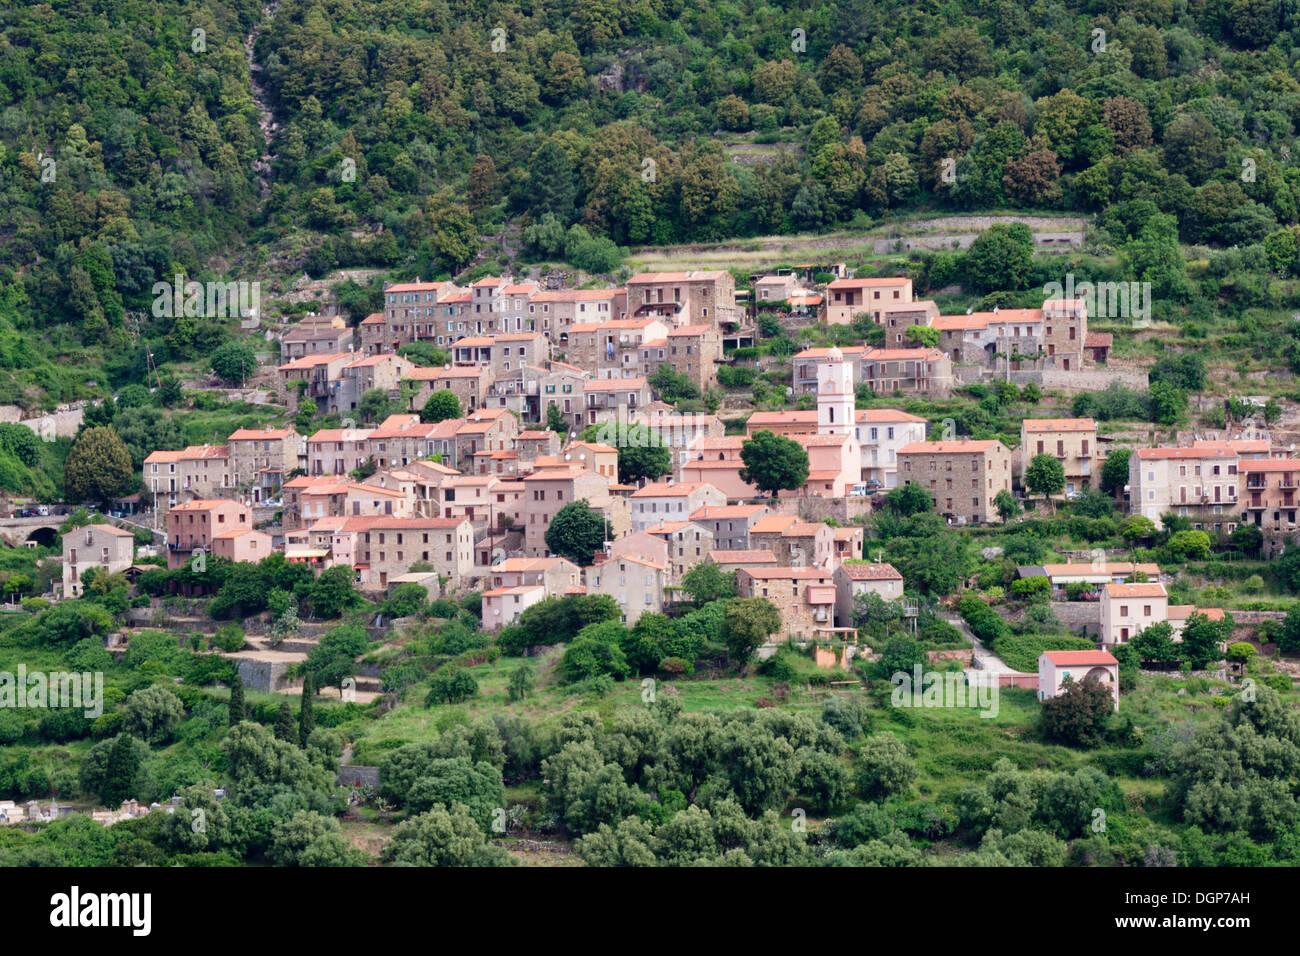 OTA, Gorges de Spelunca, Korsika, Frankreich, Europa Stockfoto